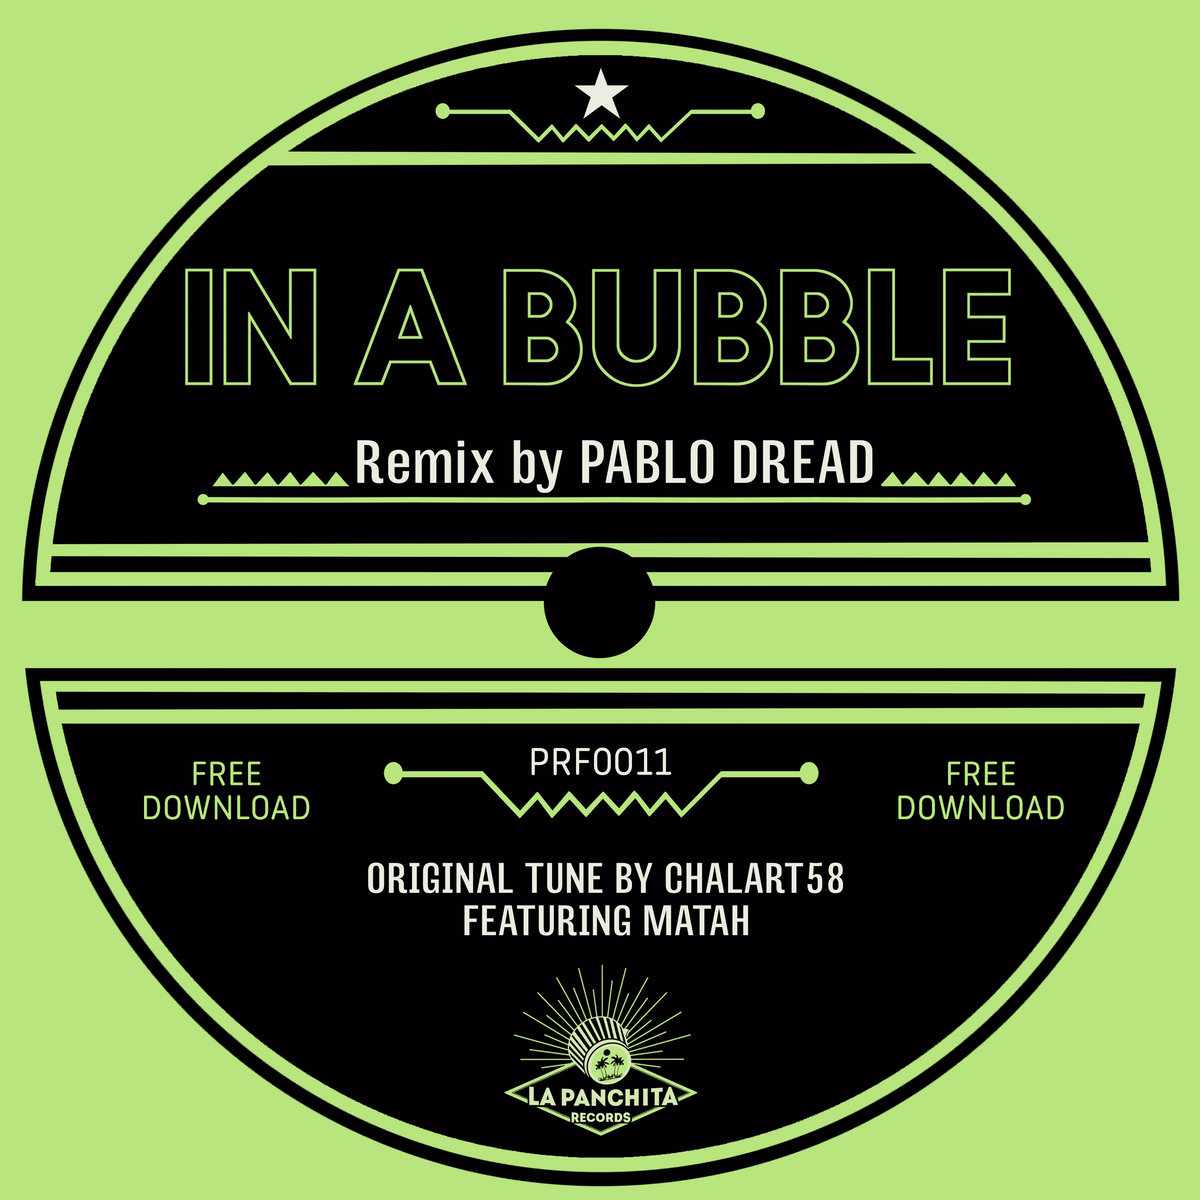 Pablo Dread - In a Bubble Remix (La Panchita Records, 2018) FREE